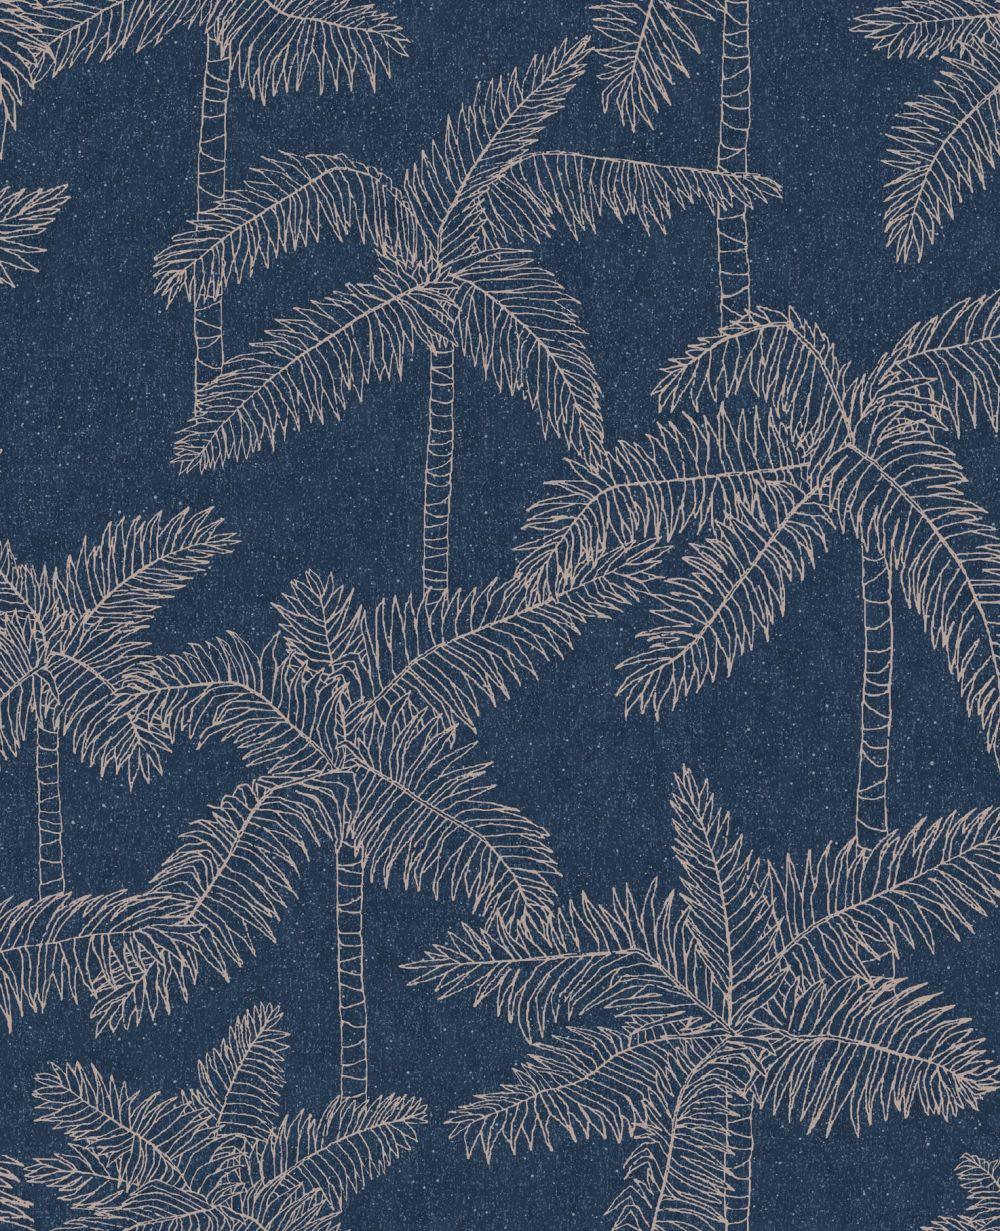 Eijffinger Palm Tree Navy Wallpaper - Product code: 384514